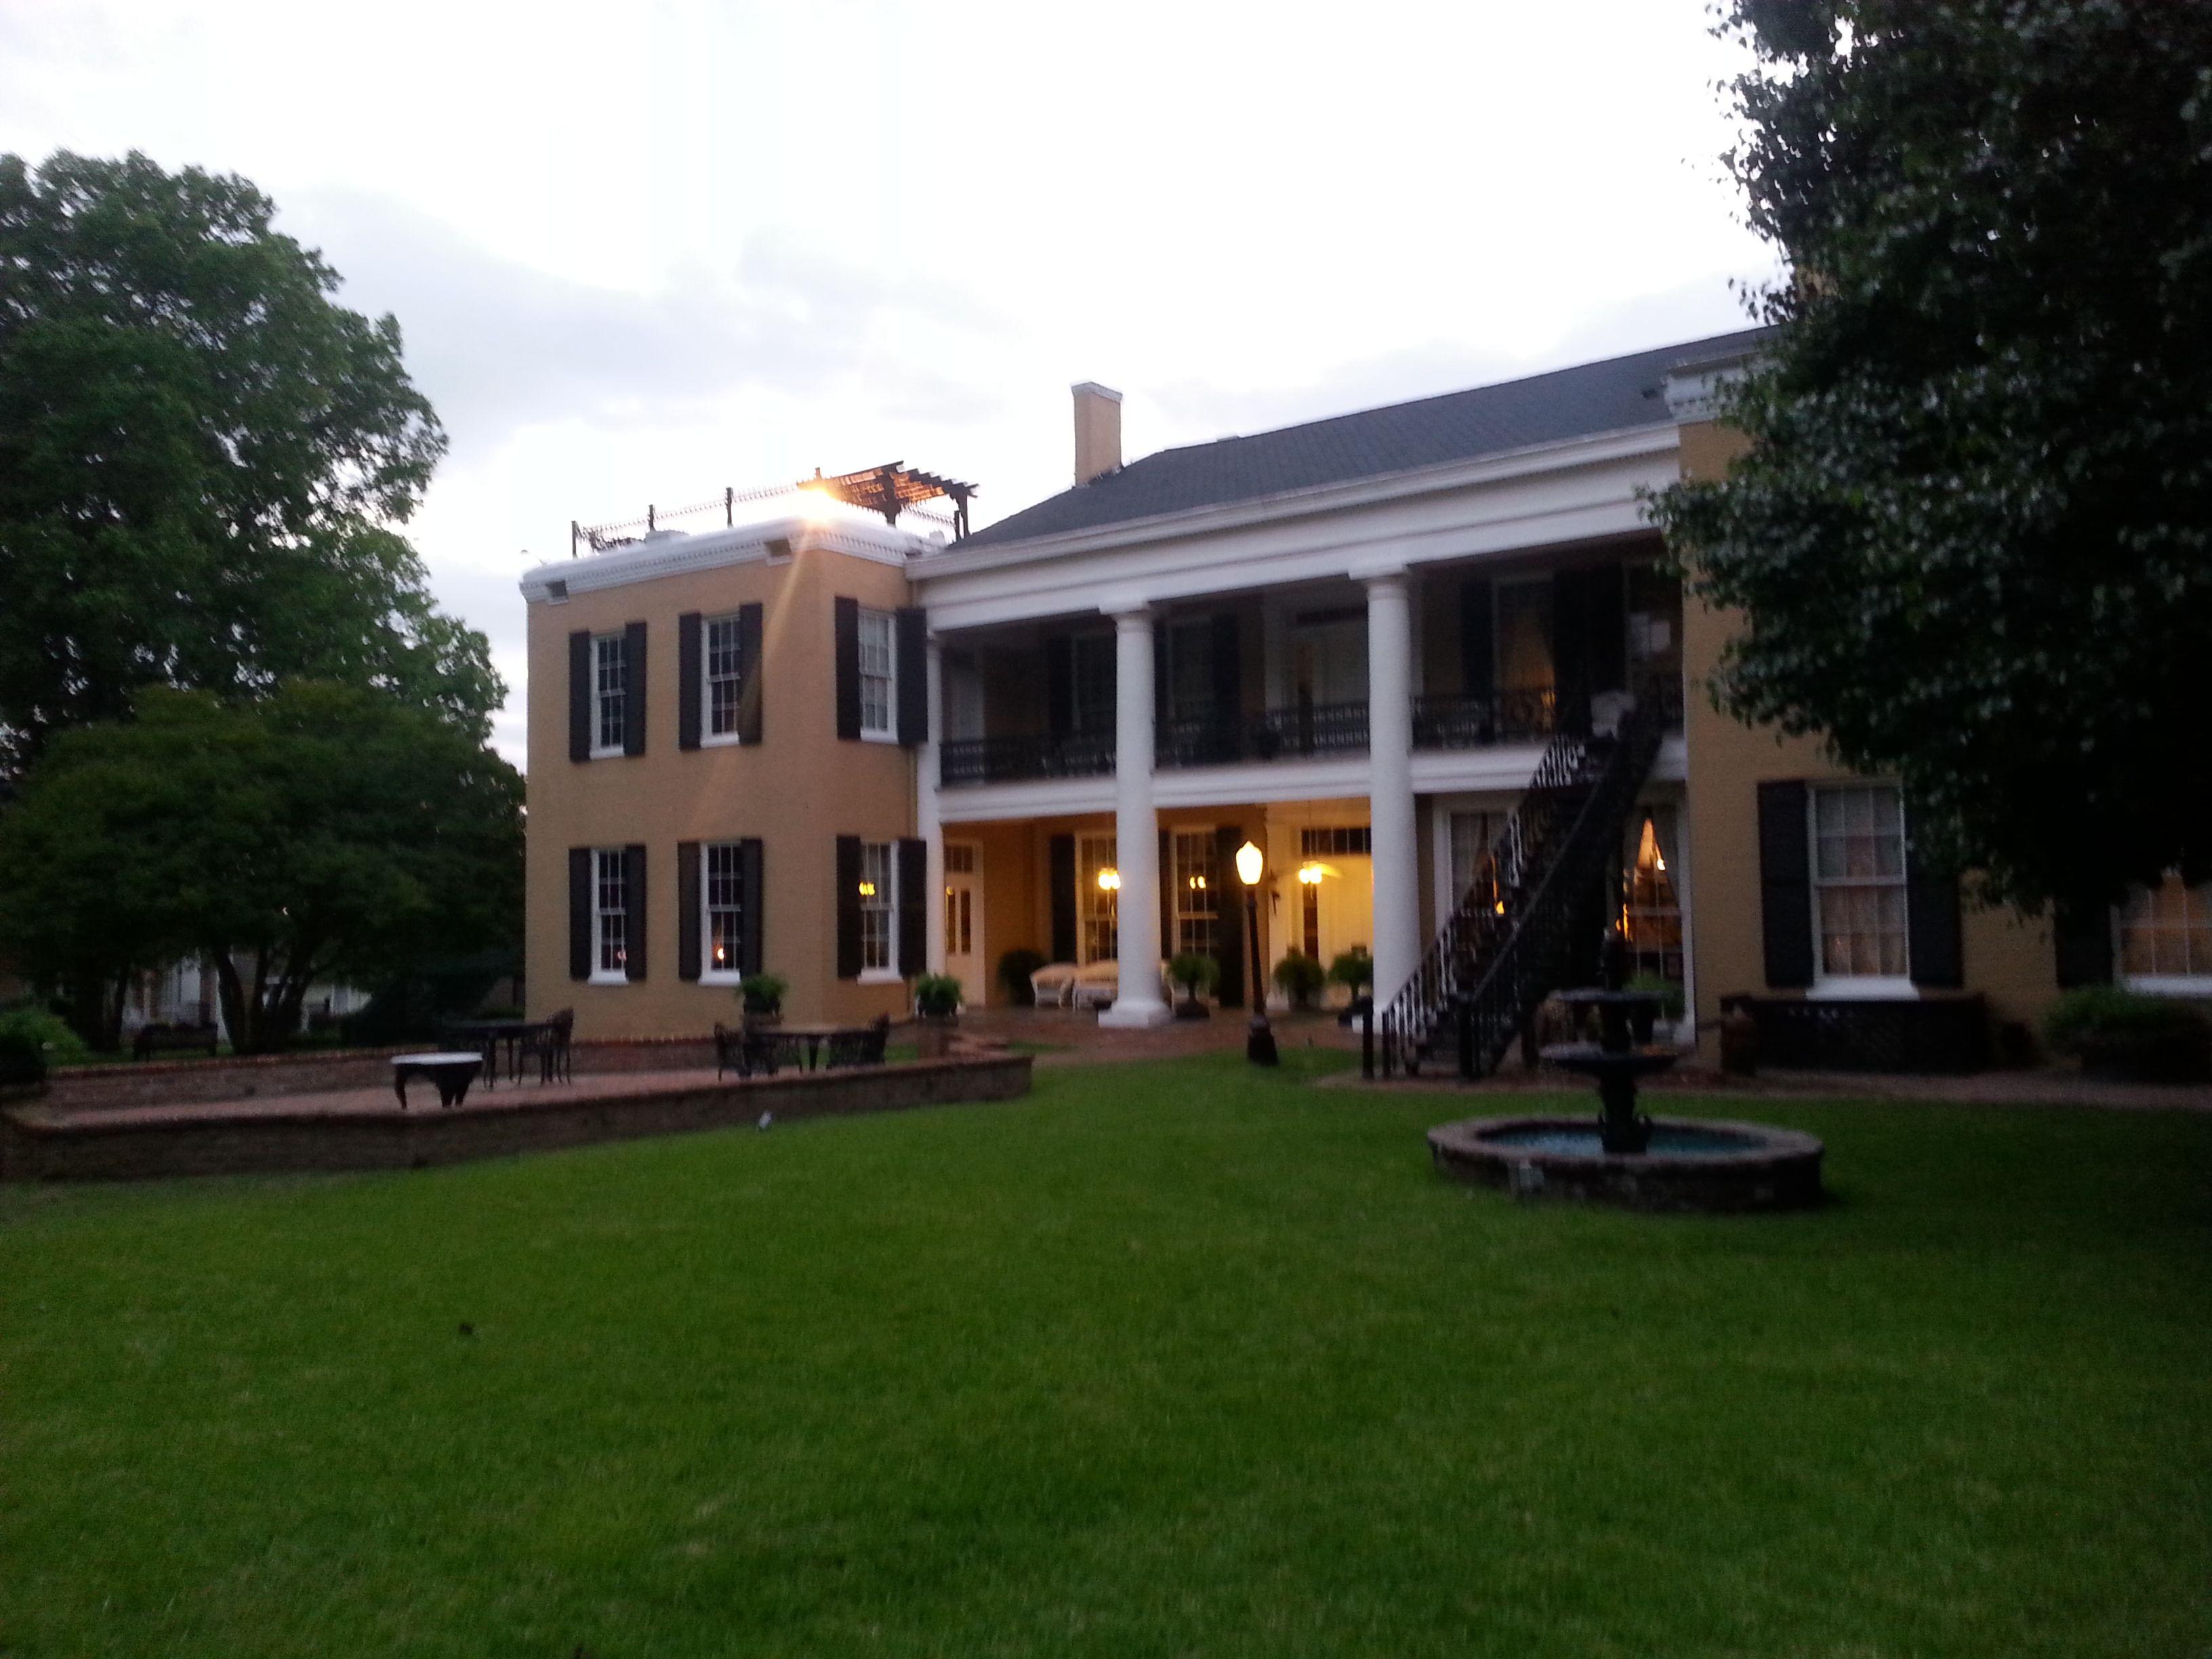 Cedar Grove Mansion Inn & Restaurant Mansions, House